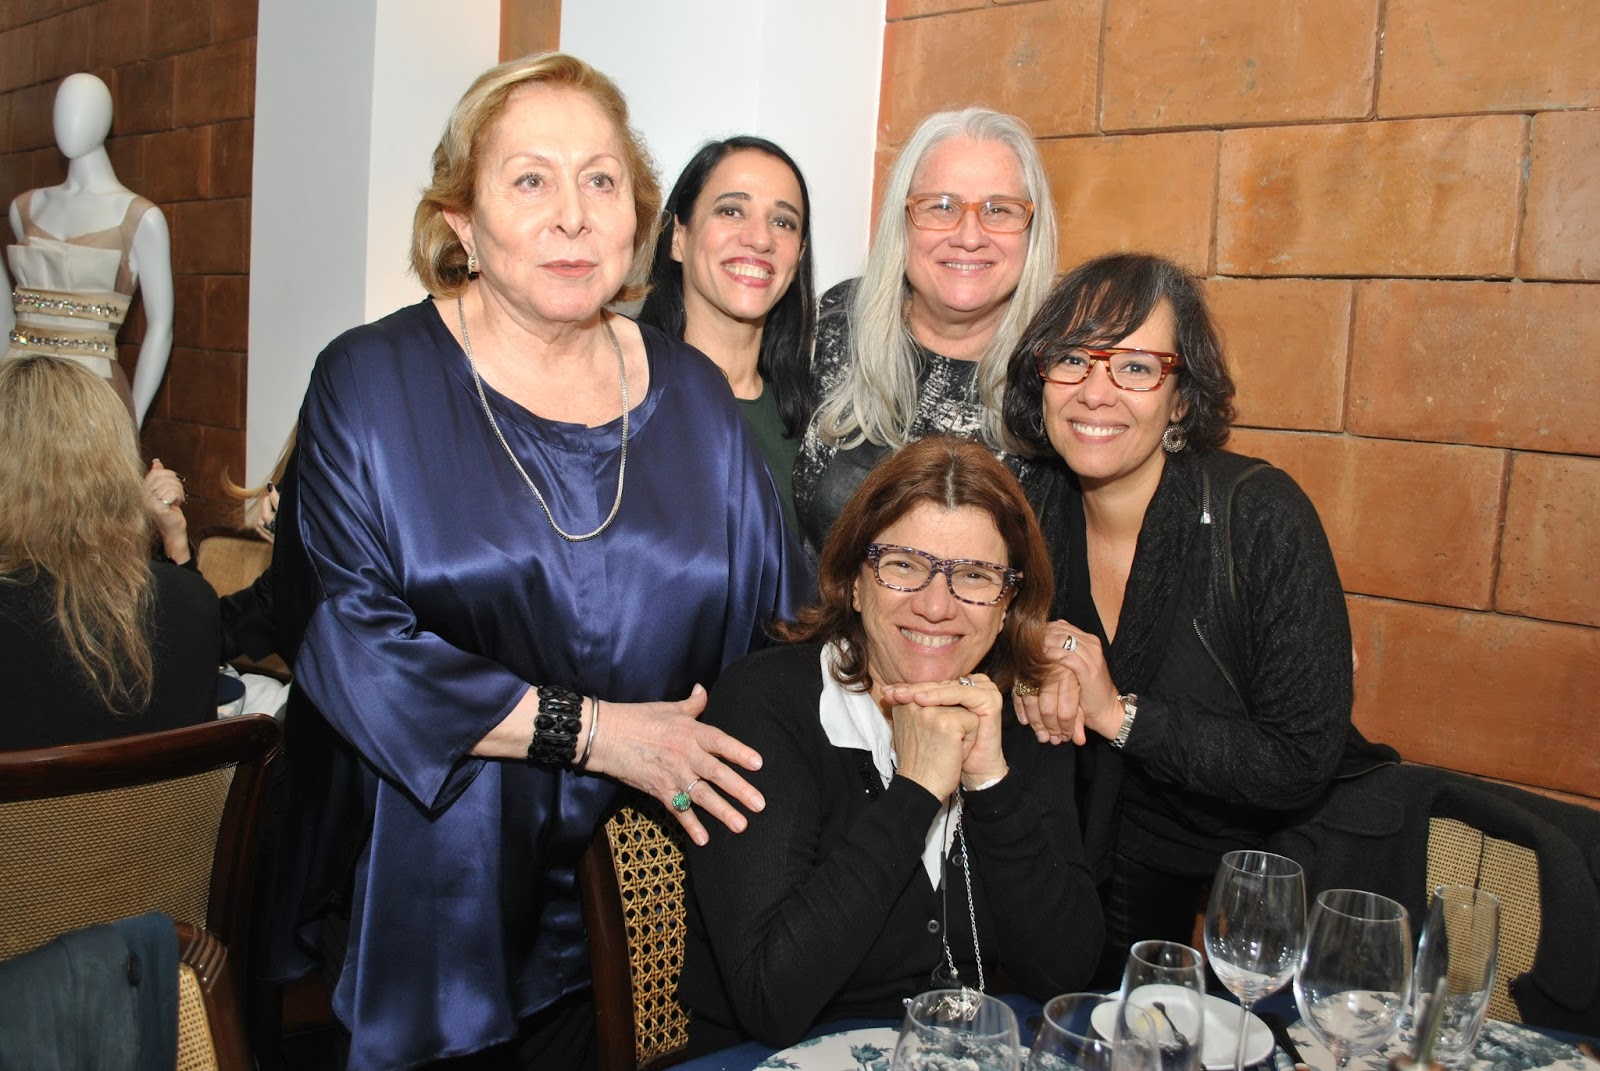 Aracy Balabanian Classy franklin toscano   embaixador do rio : vera holtz e aracy